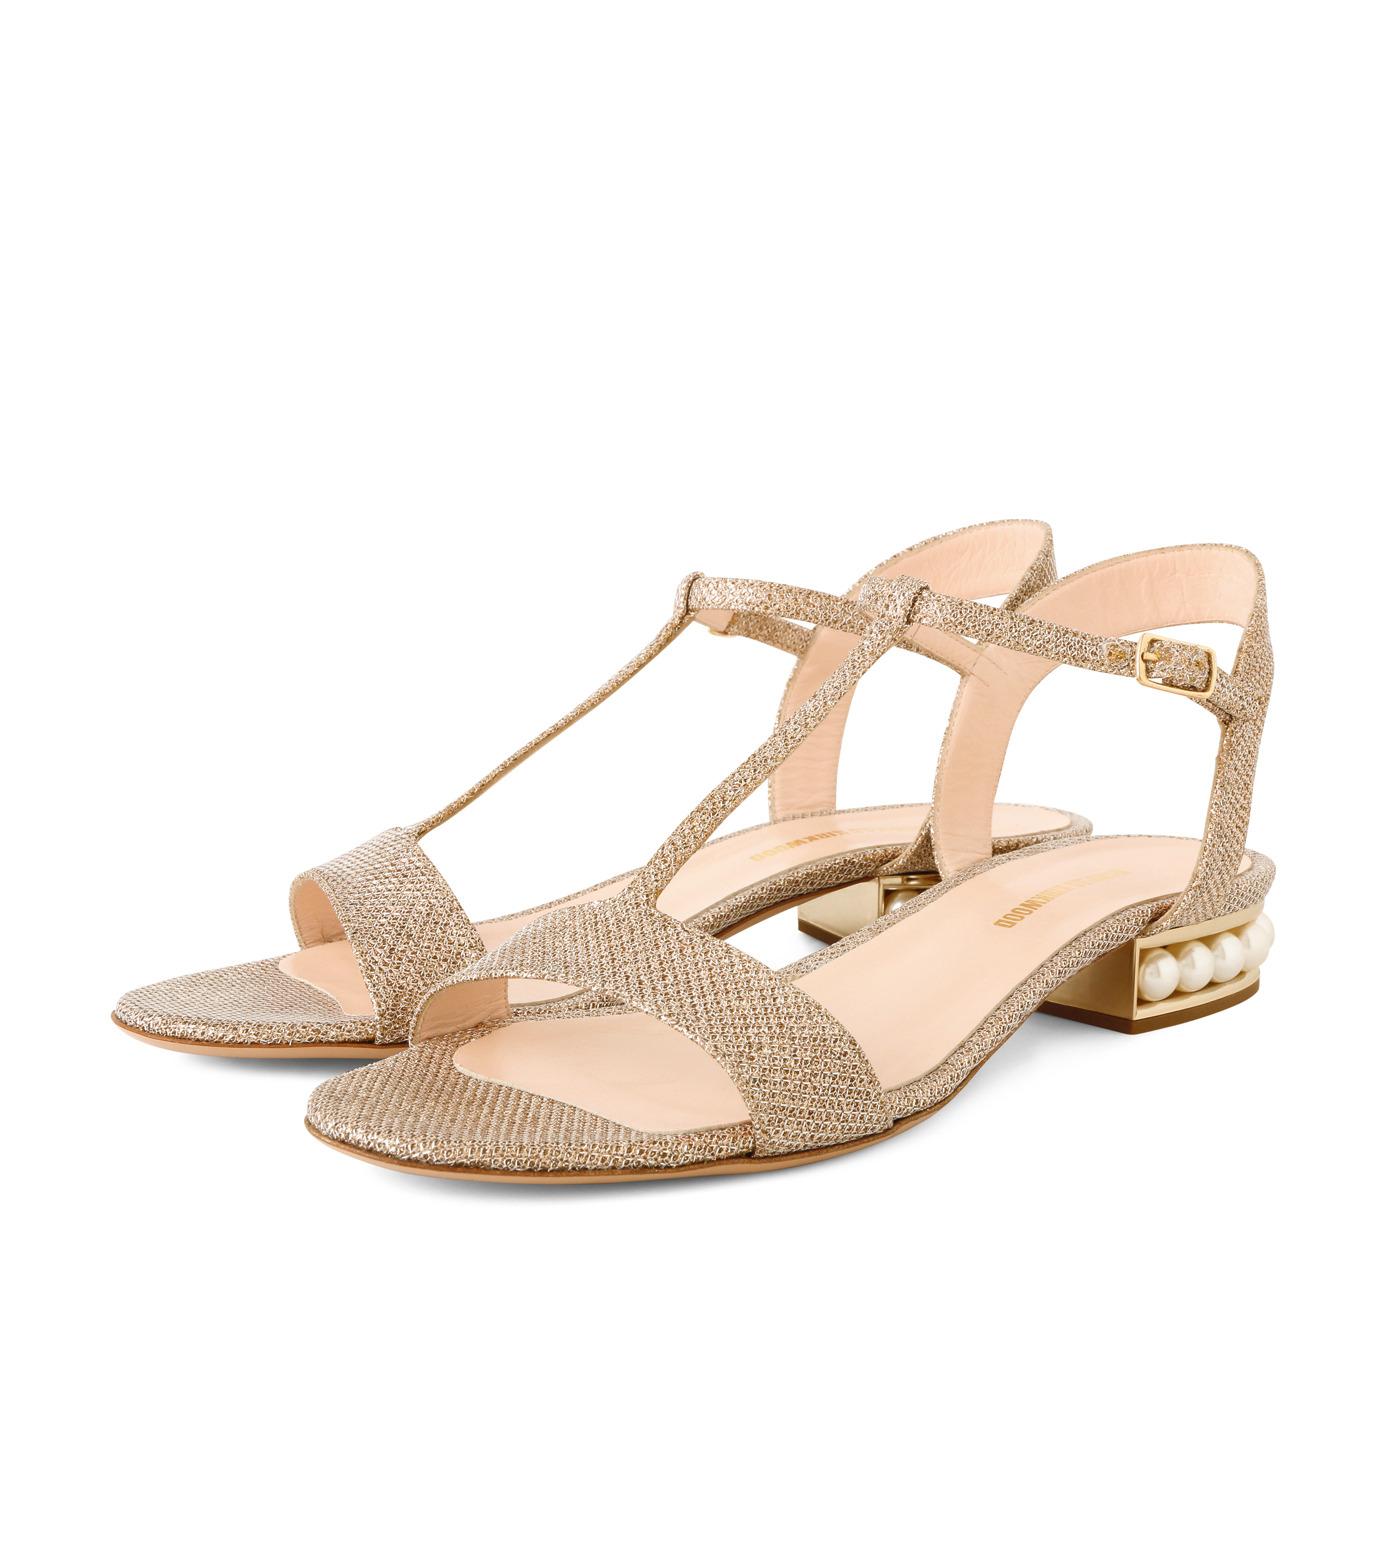 Nicholas  Kirkwood(ニコラス カークウッド)のCasati Pearl Sandal-GOLD(フラットシューズ/Flat shoes)-16S0451-2 拡大詳細画像3